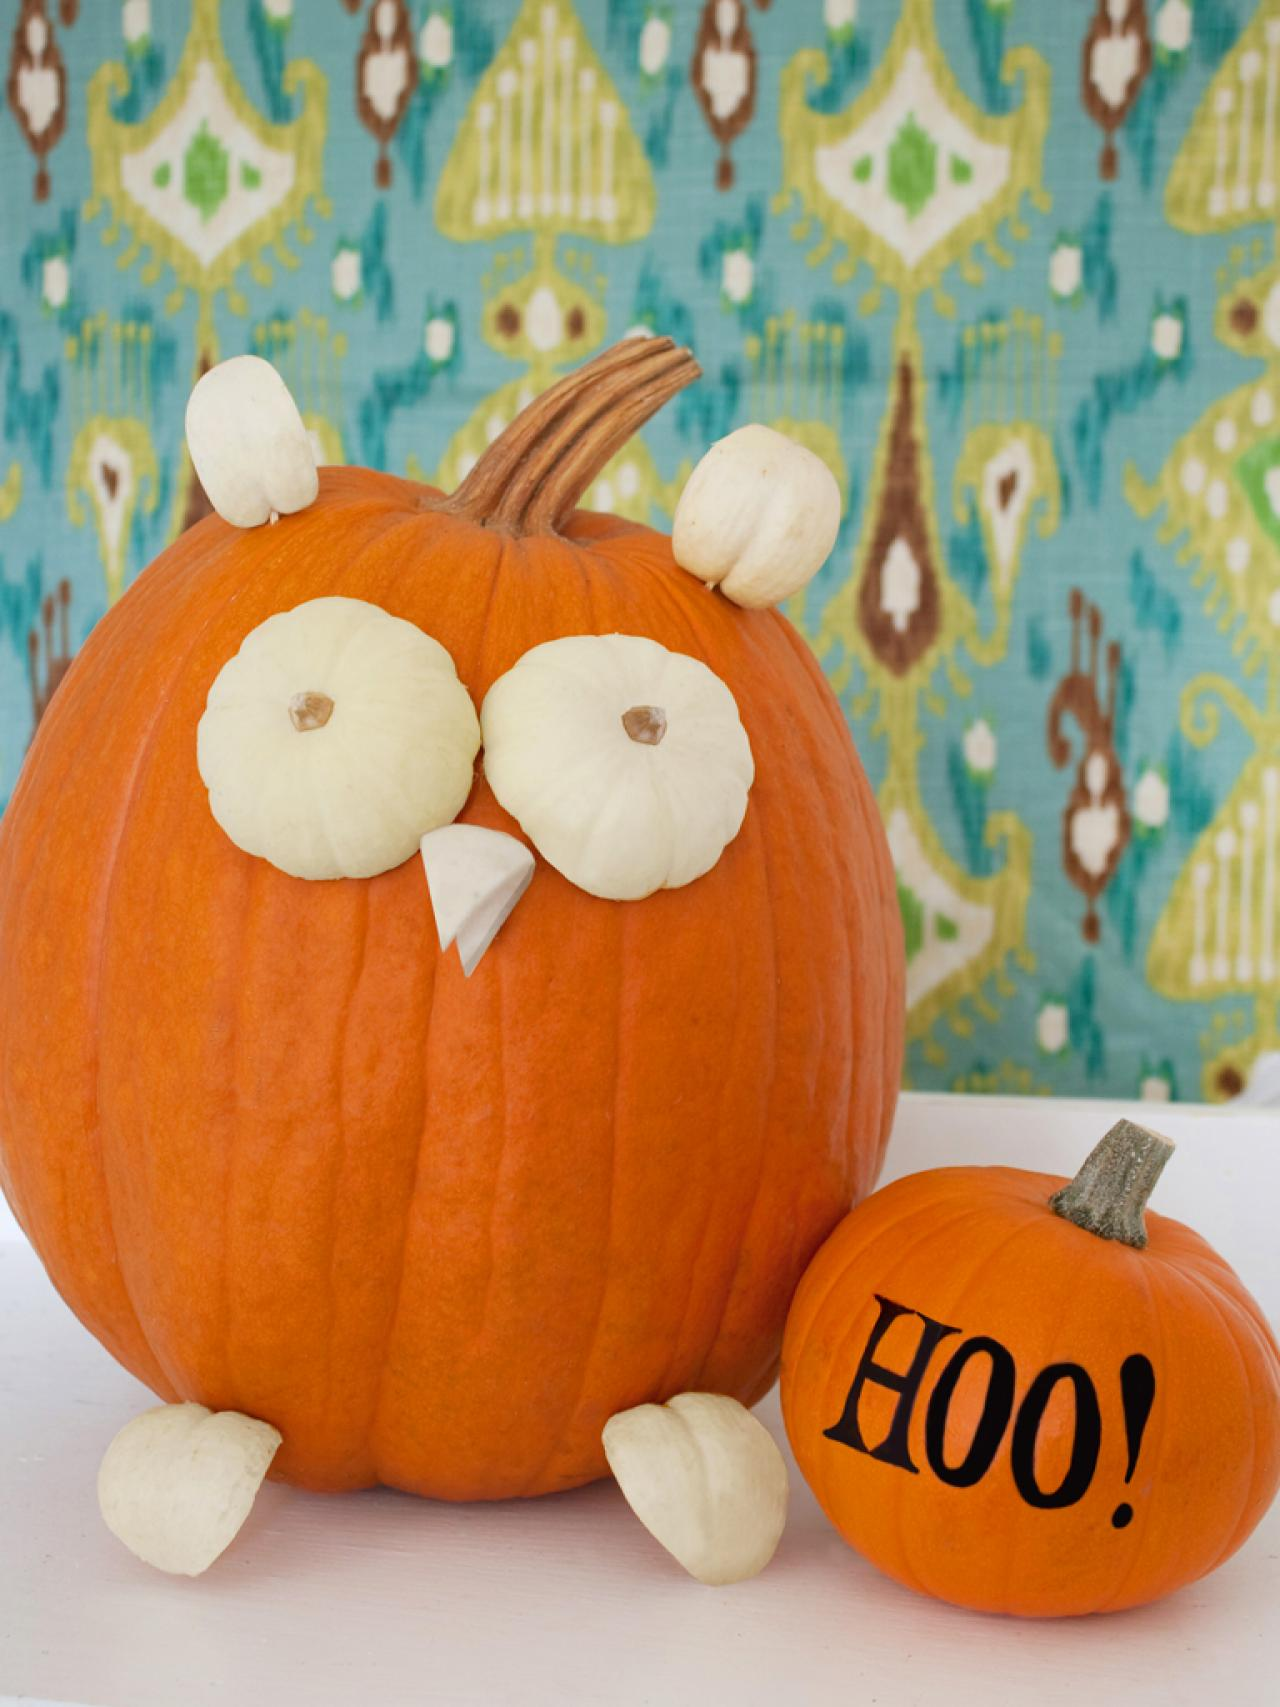 Homemade halloween decorations for kids - Outdoor Halloween Decorations For Kids Hgtv S Decorating Design Blog Hgtv